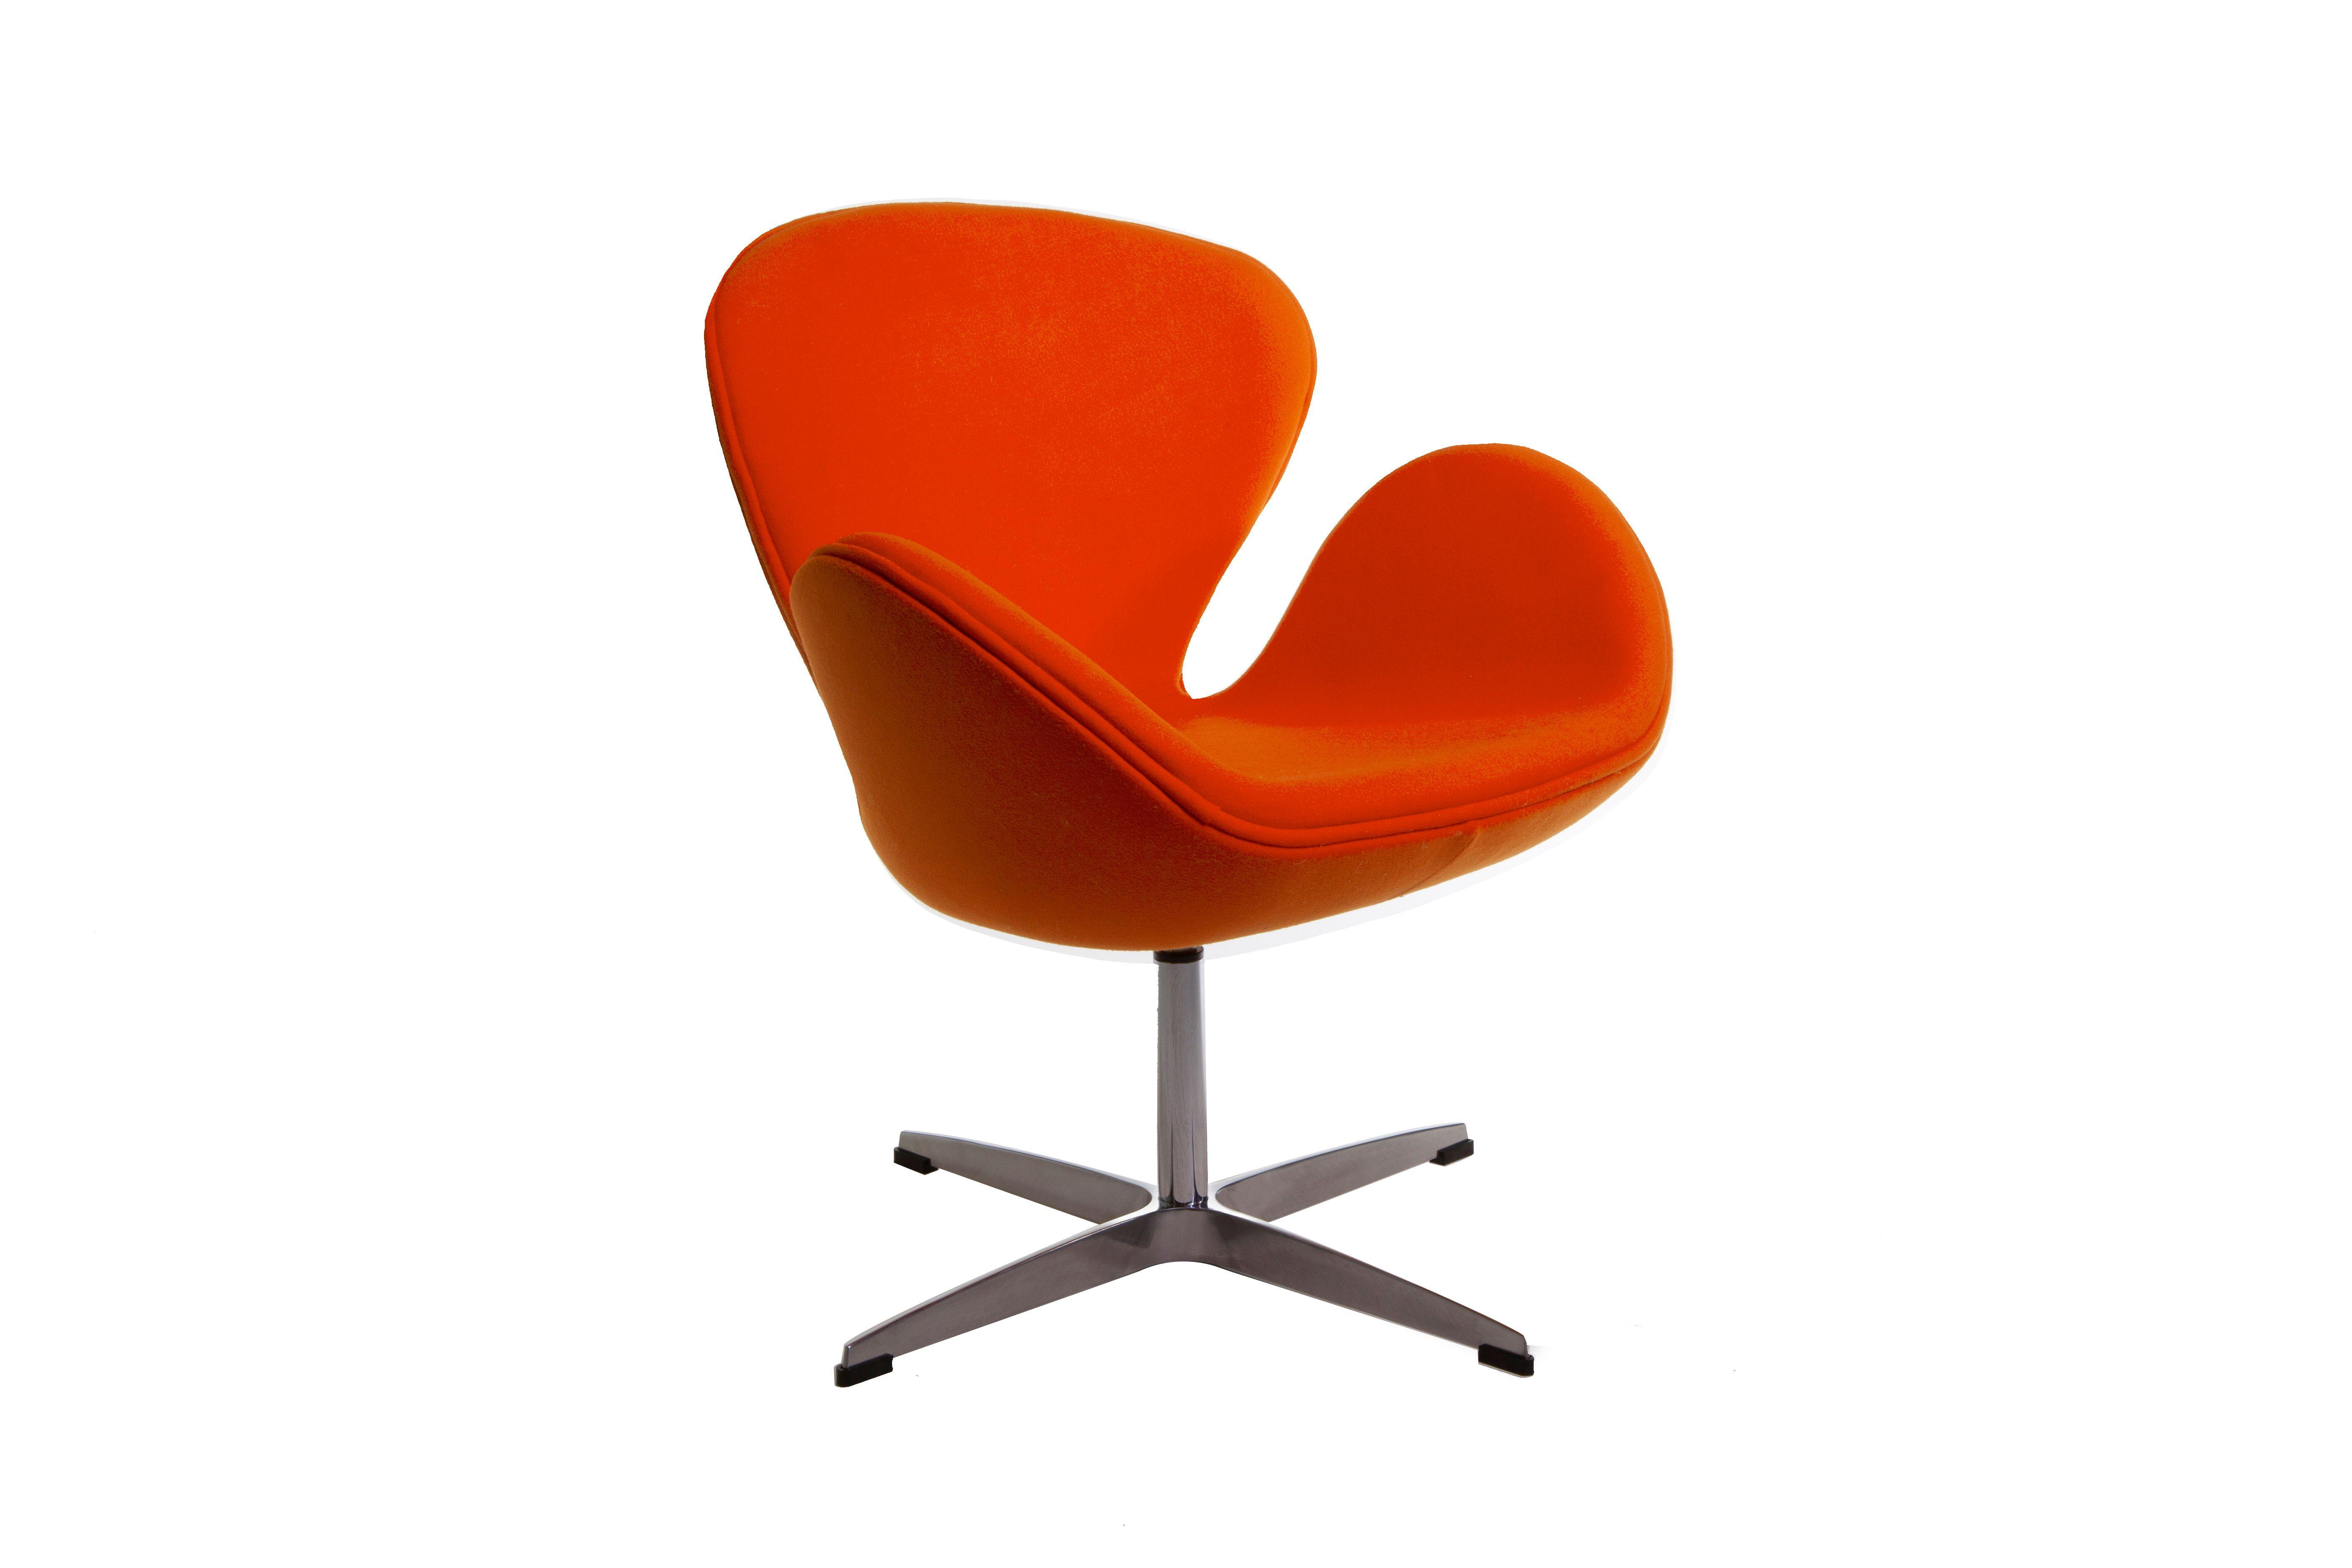 Oranje Design Fauteuil.Fauteuil Herlev Oranje Van Lil Design Kopen Bij Lil